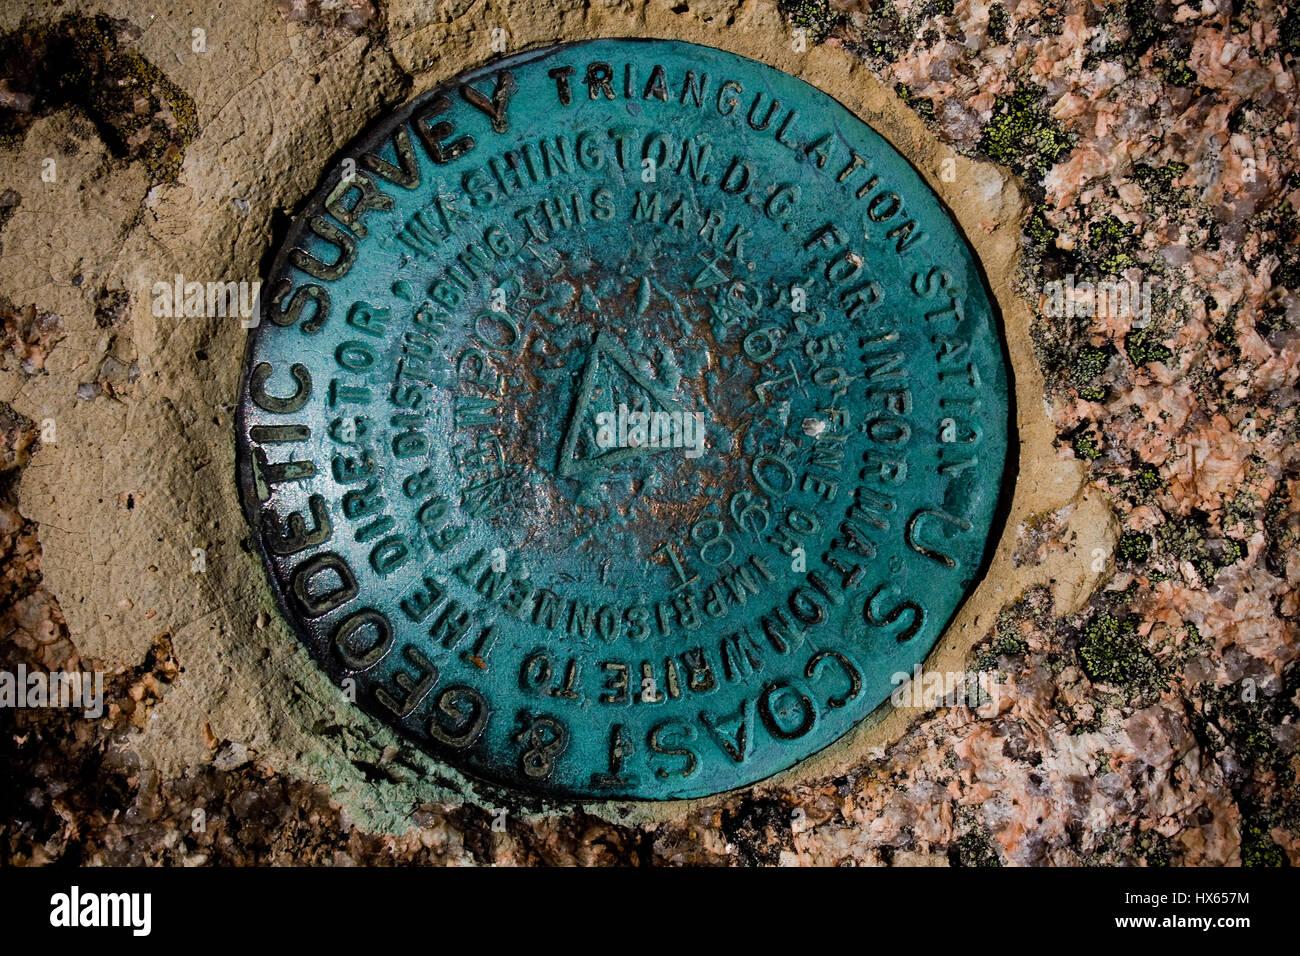 A geodetic survey marker at Acadia National Park near Bar Harbor, Maine. - Stock Image